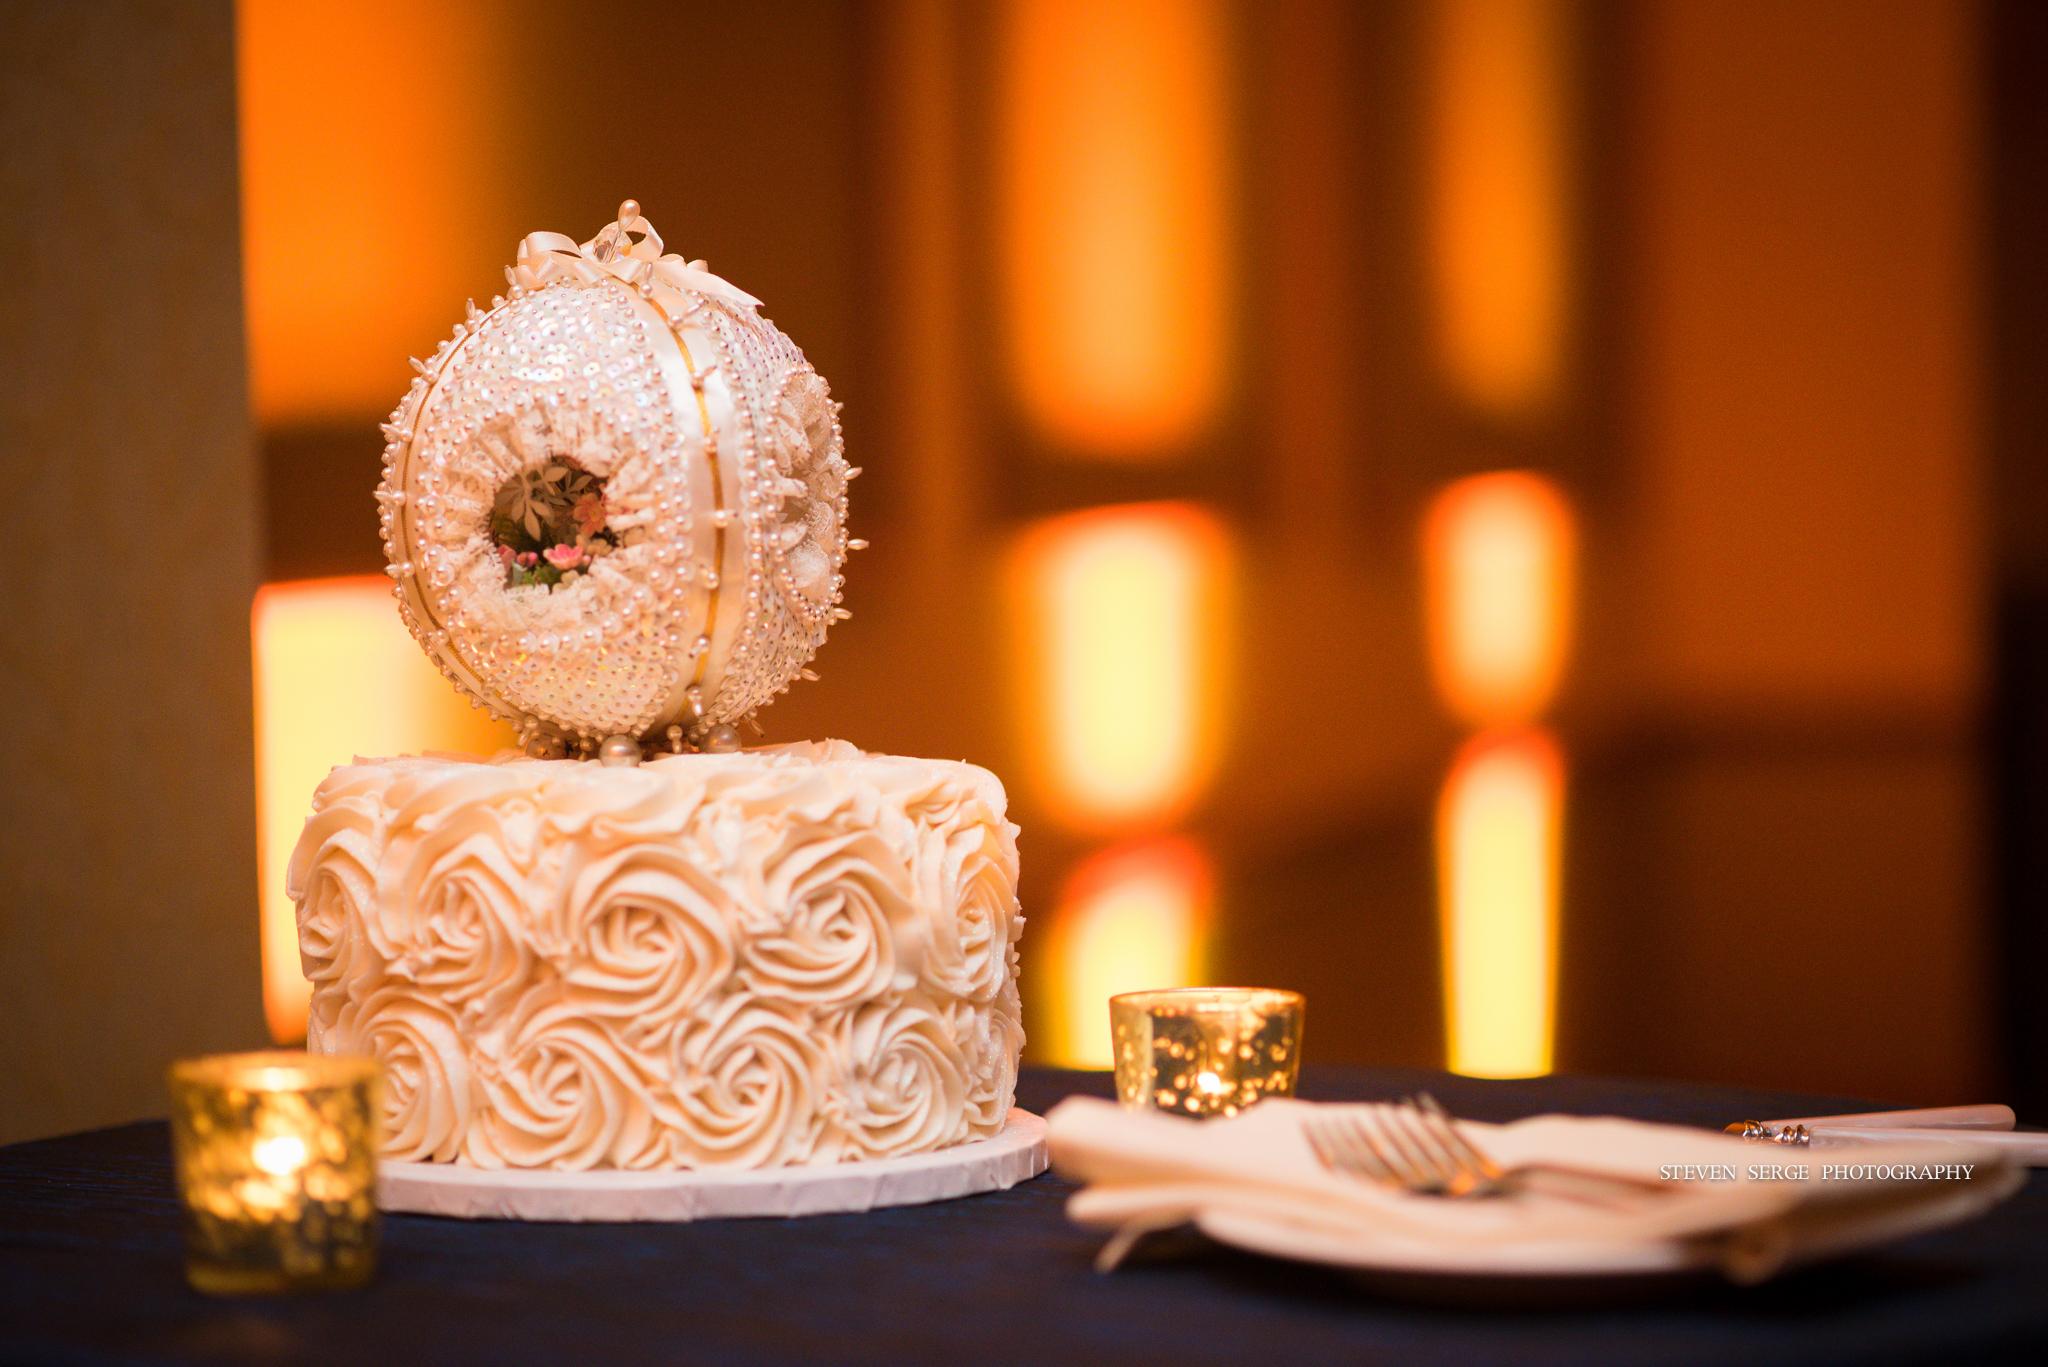 scranton-wedding-photographers-hilton-steven-serge-photography-4.jpg